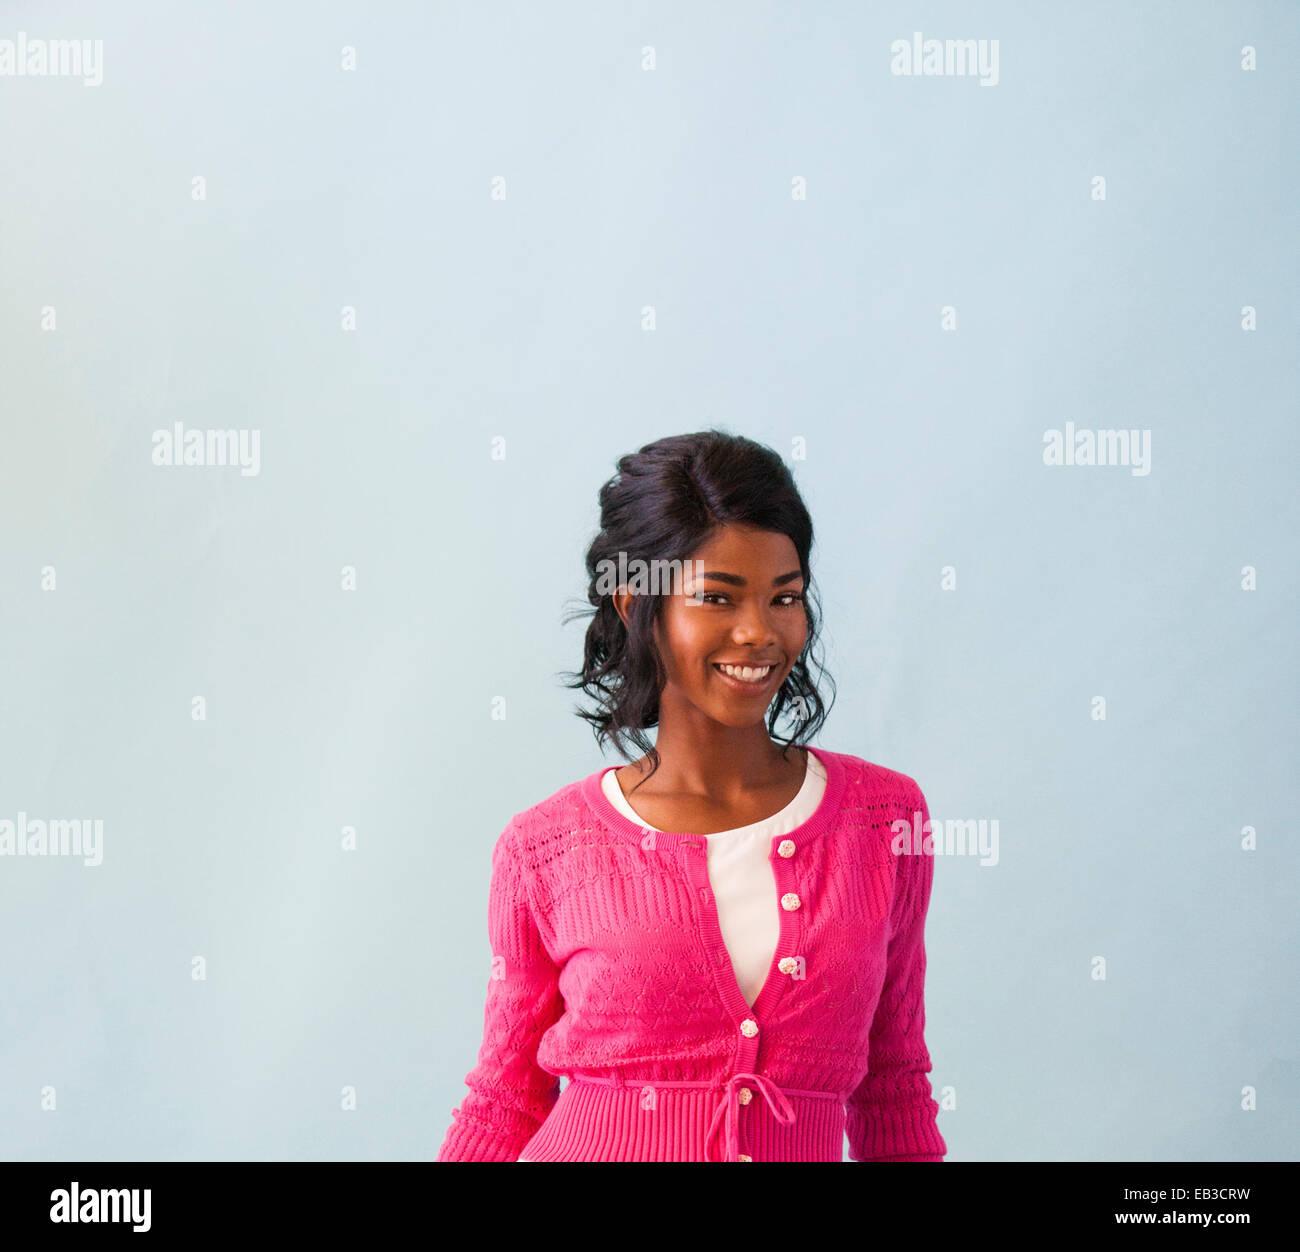 Studio portrait of smiling mid adult woman wearing pink cardigan - Stock Image